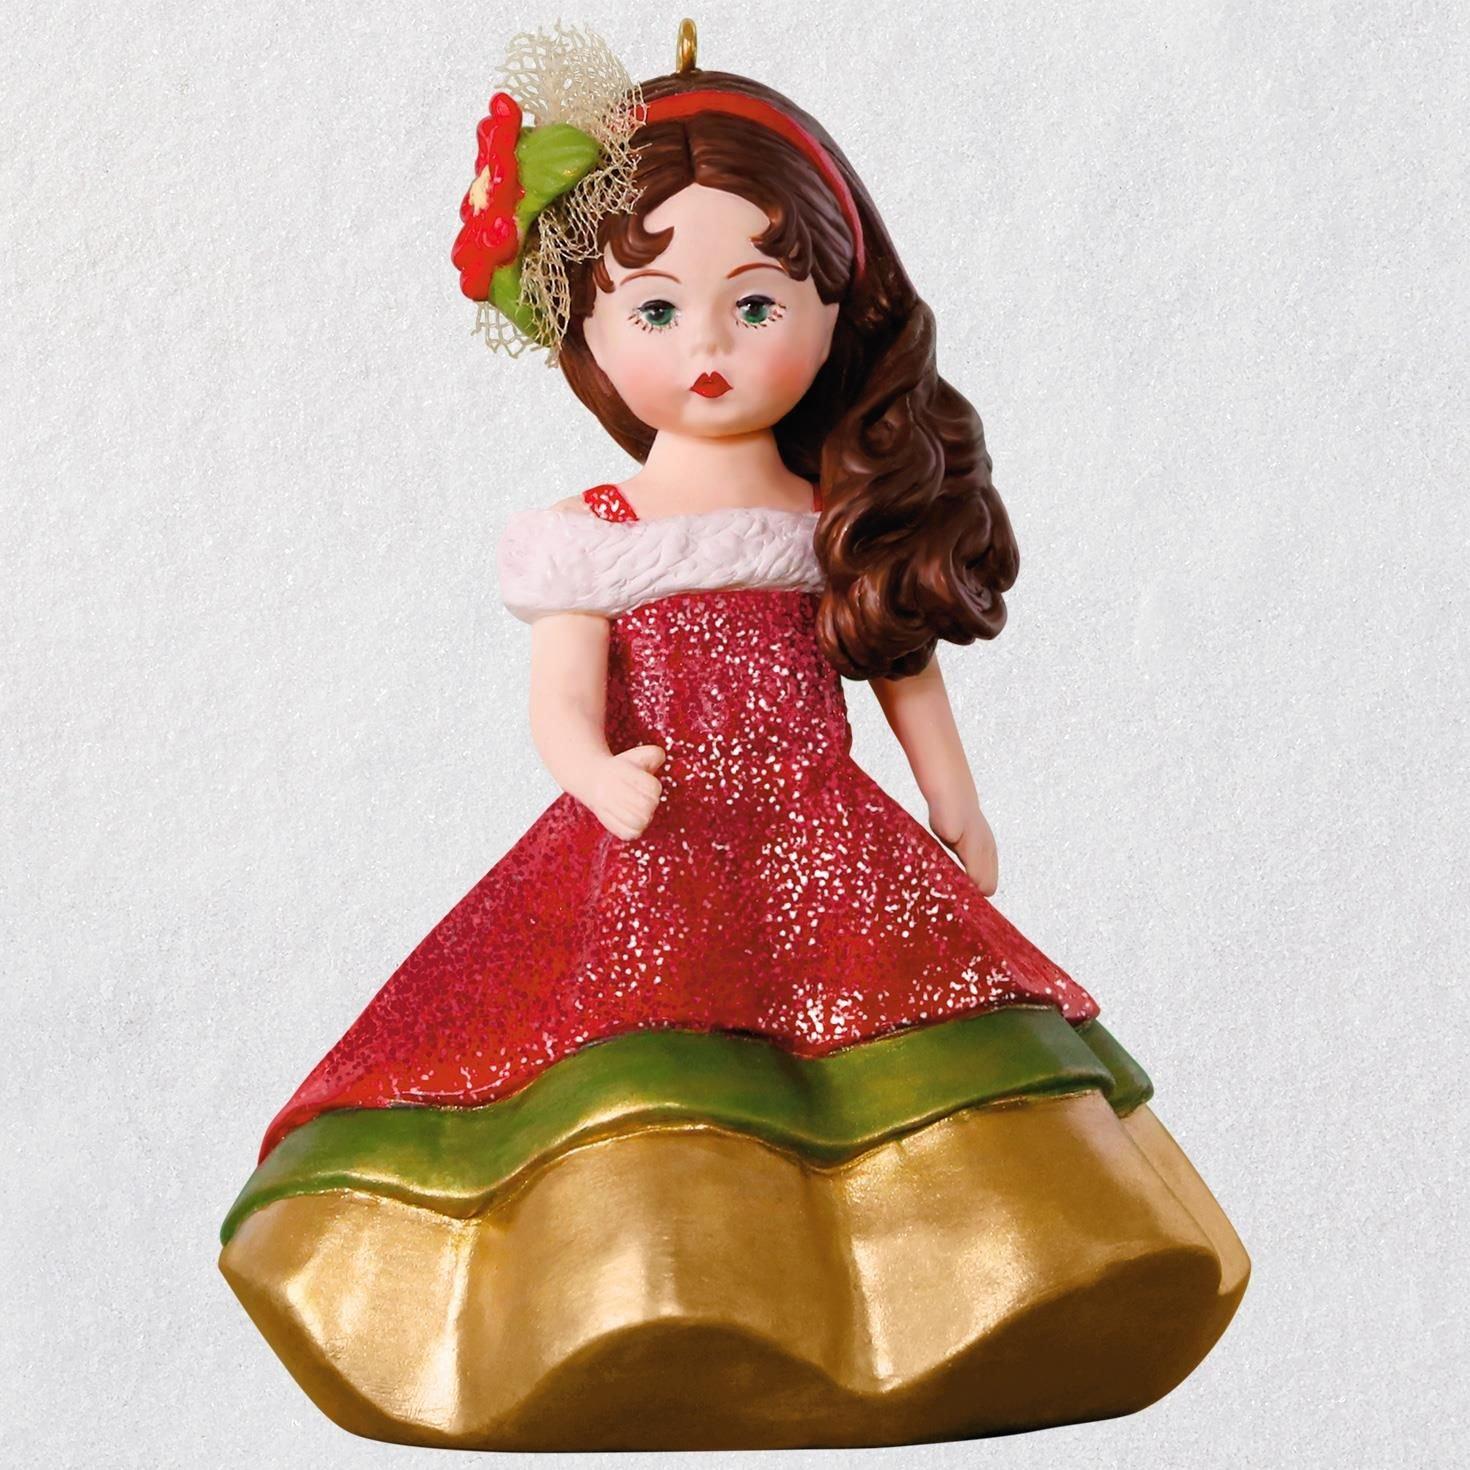 Madame Alexander Holidazzle Ornament keepsake-ornaments Toys & Gaming